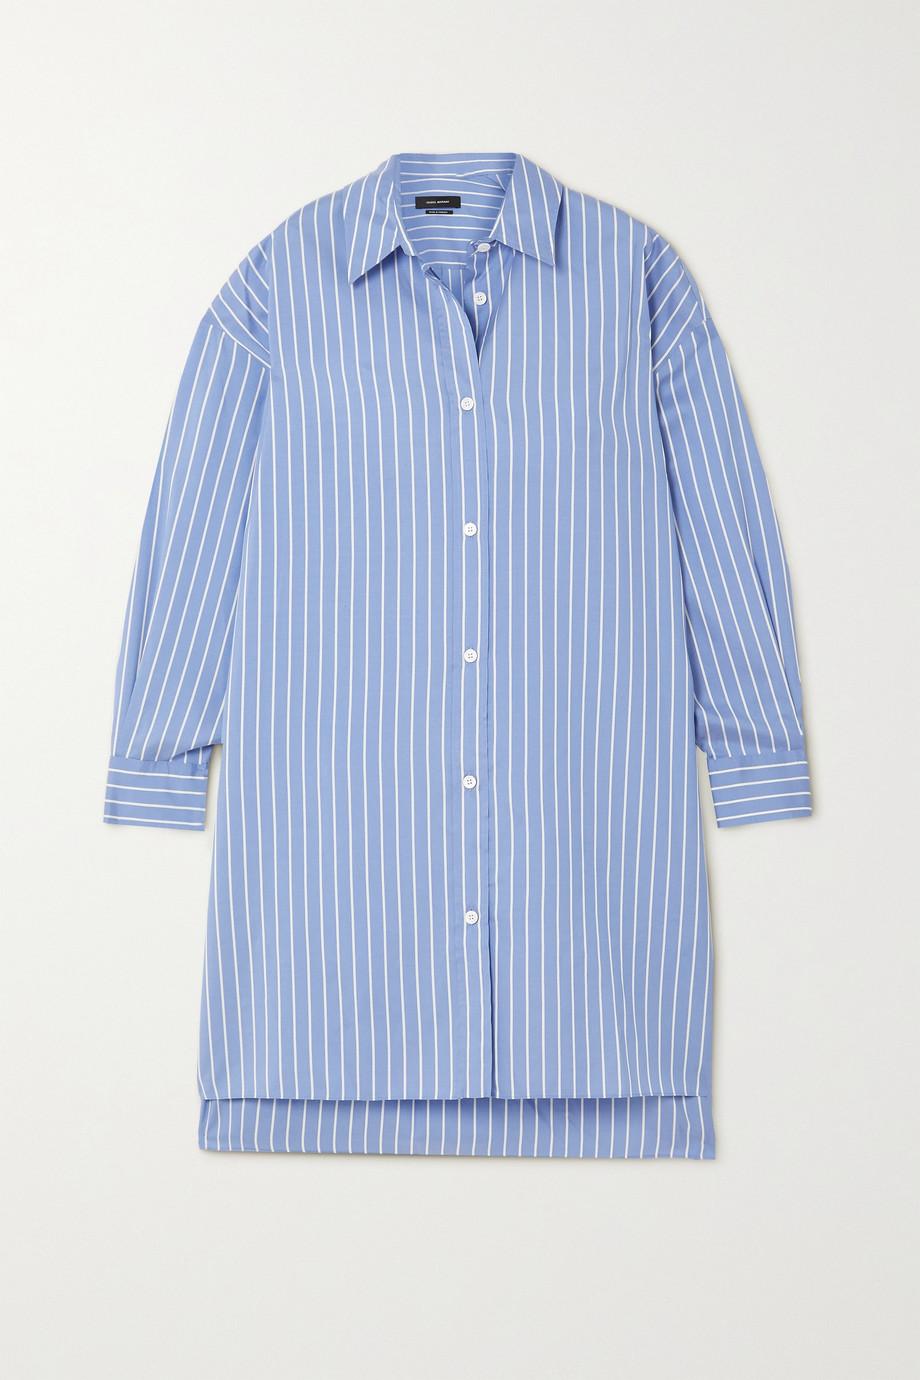 Isabel Marant Macali oversized striped silk shirt